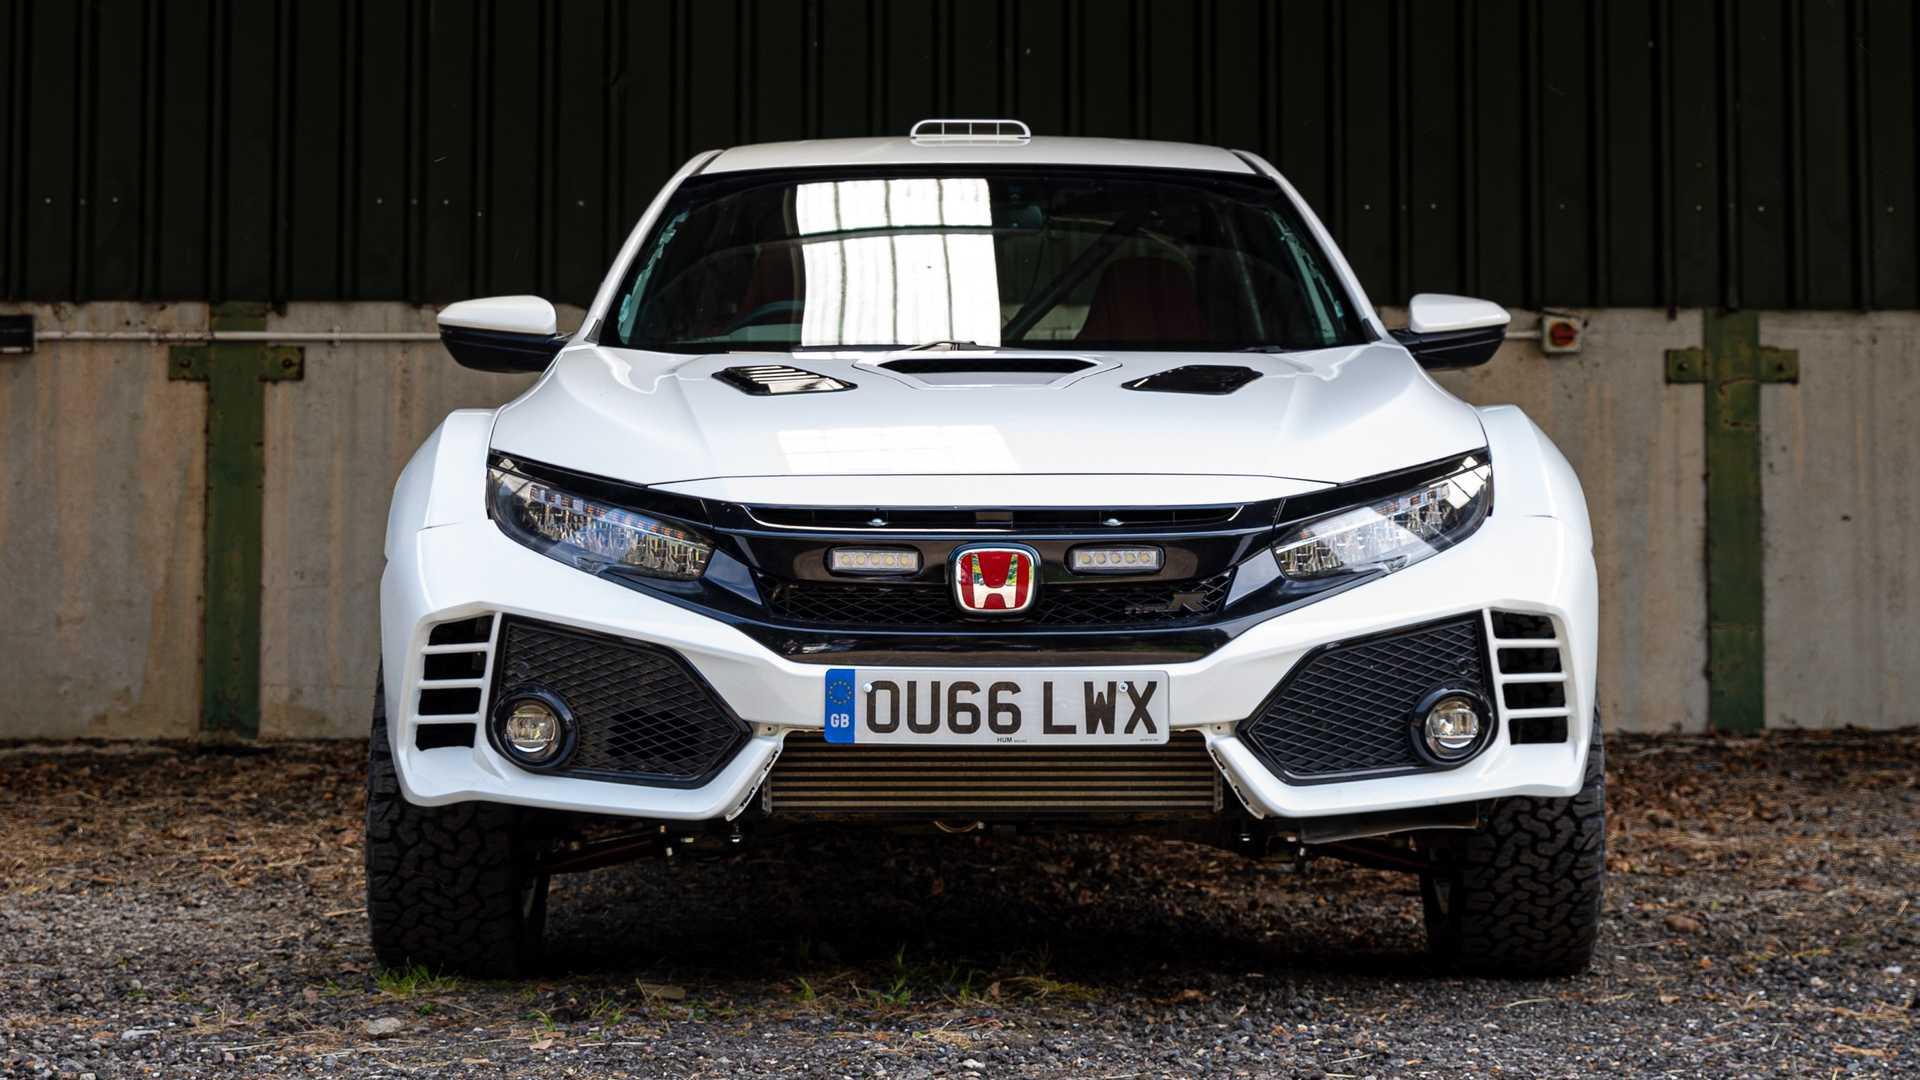 Honda-Civic-Type-R-rally-car-4